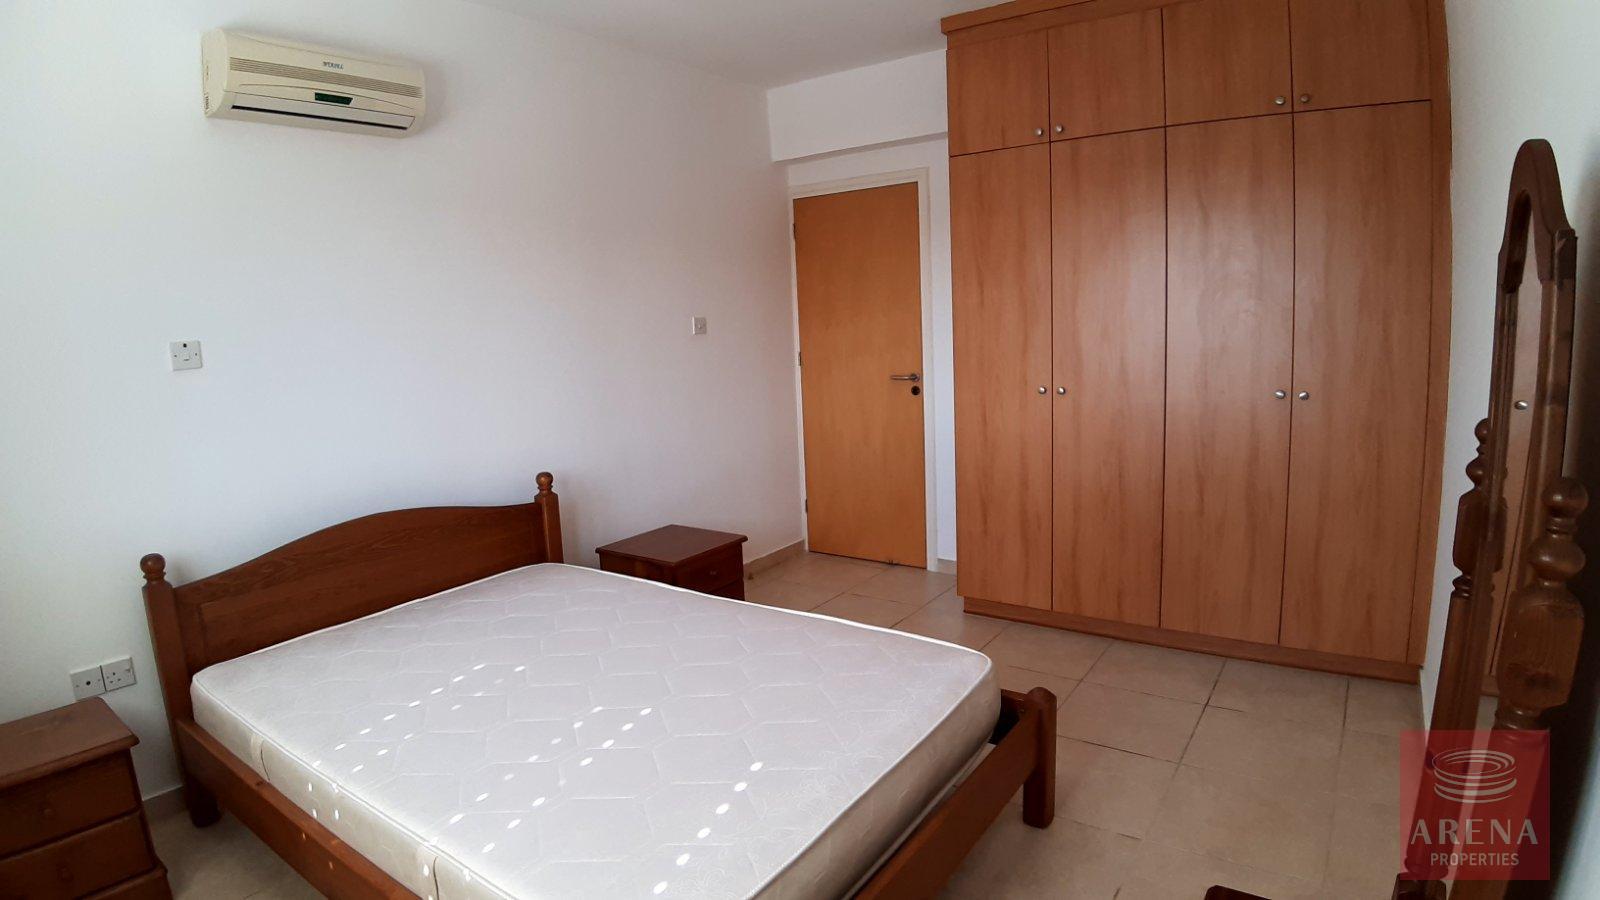 2 Bed Apt for rent in Paralimni - bedroom